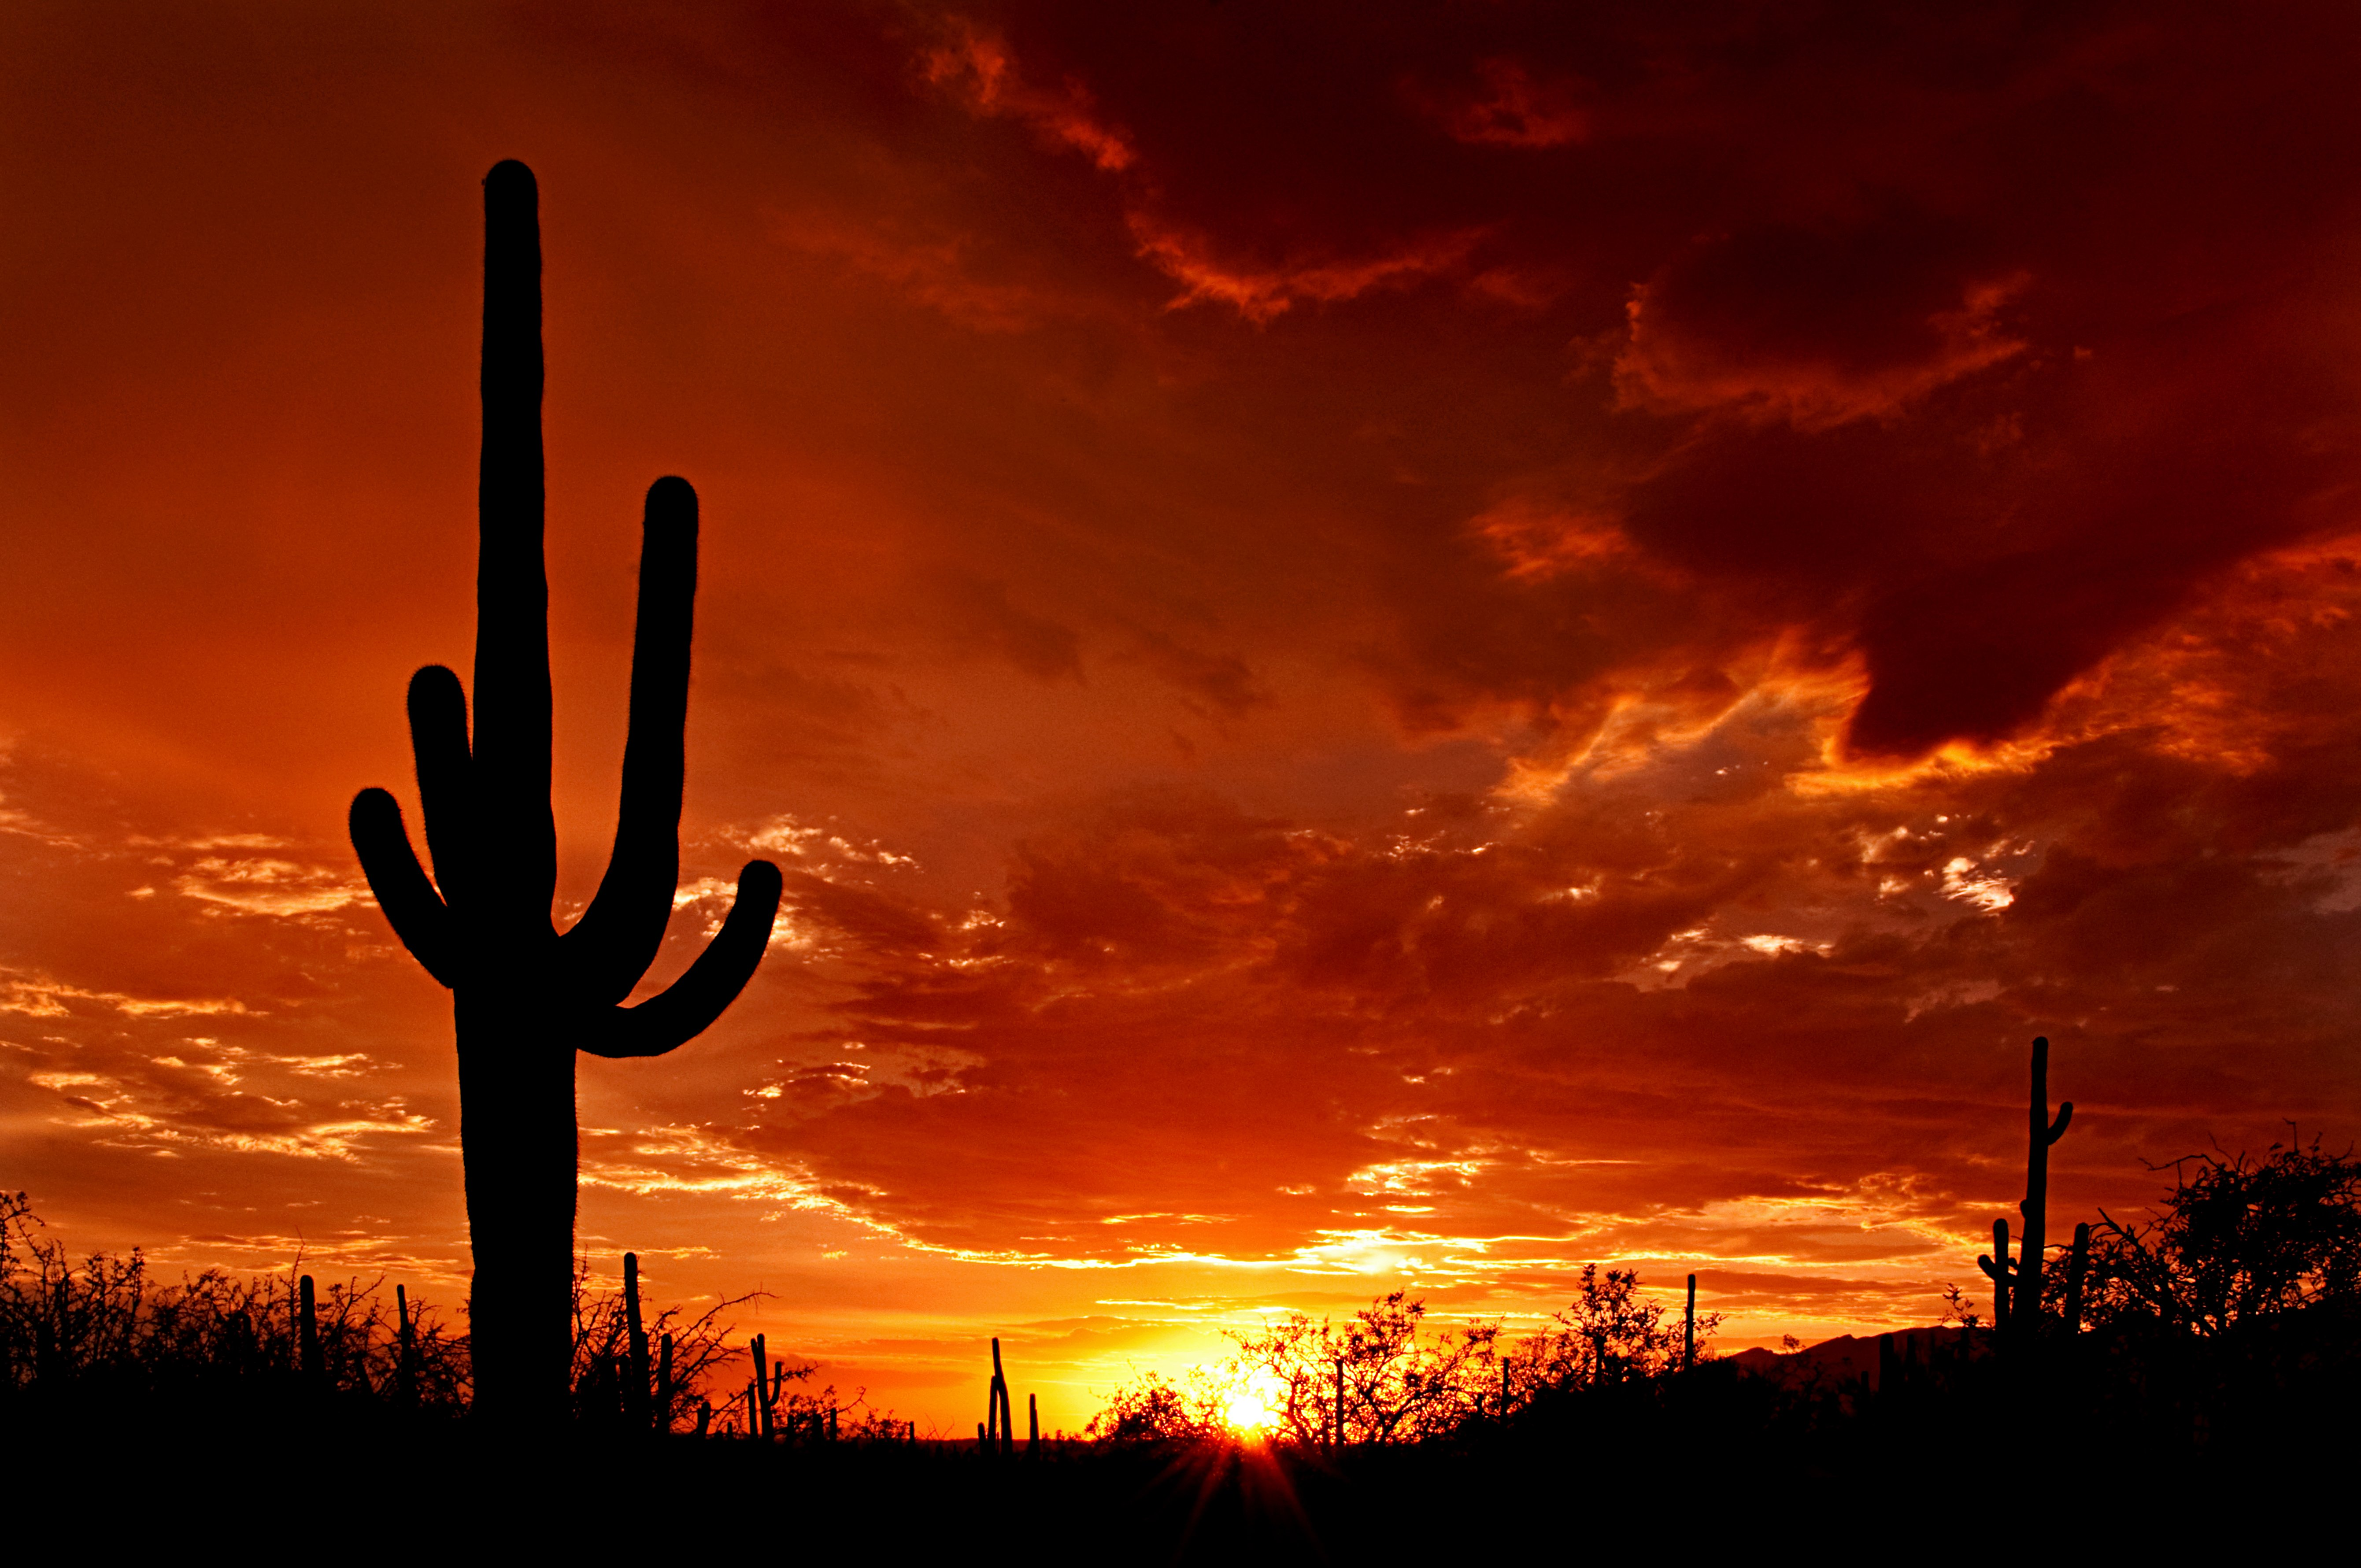 wallpaper sunset mountain arizona - photo #20